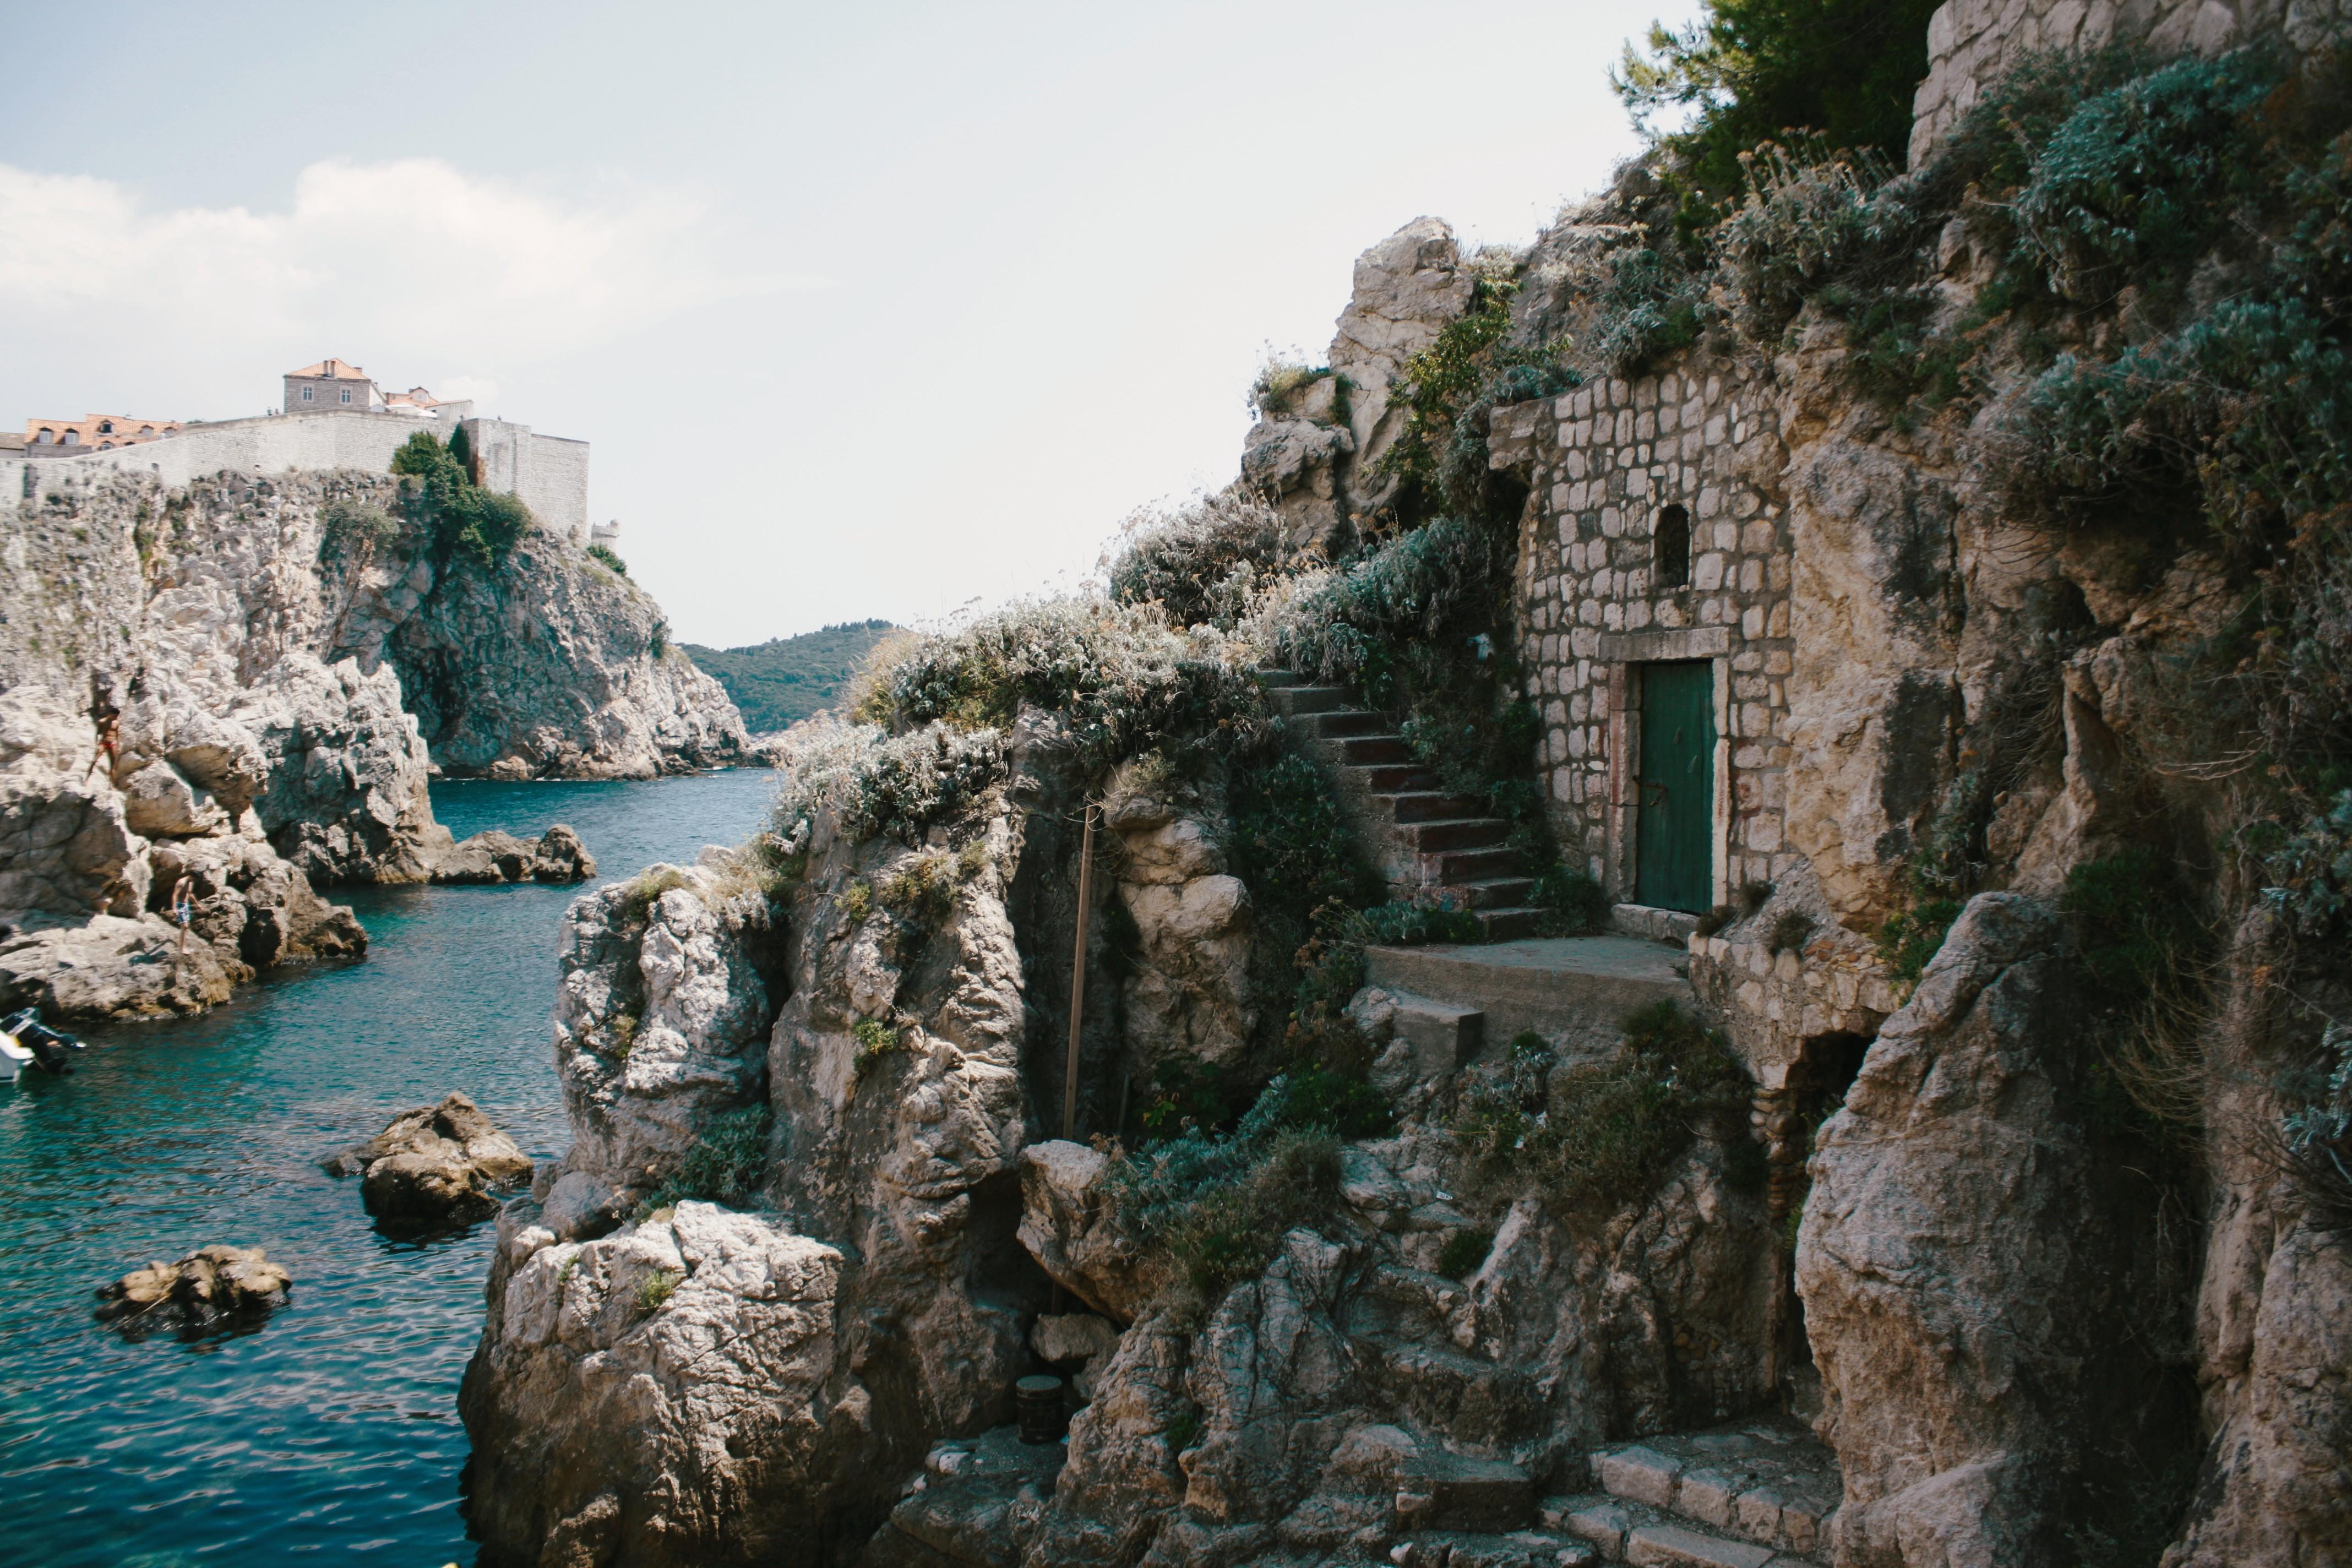 Rental Car Places >> Free Images : sea, coast, water, rock, cloud, steps, vacation, travel, cliff, landmark, tourism ...